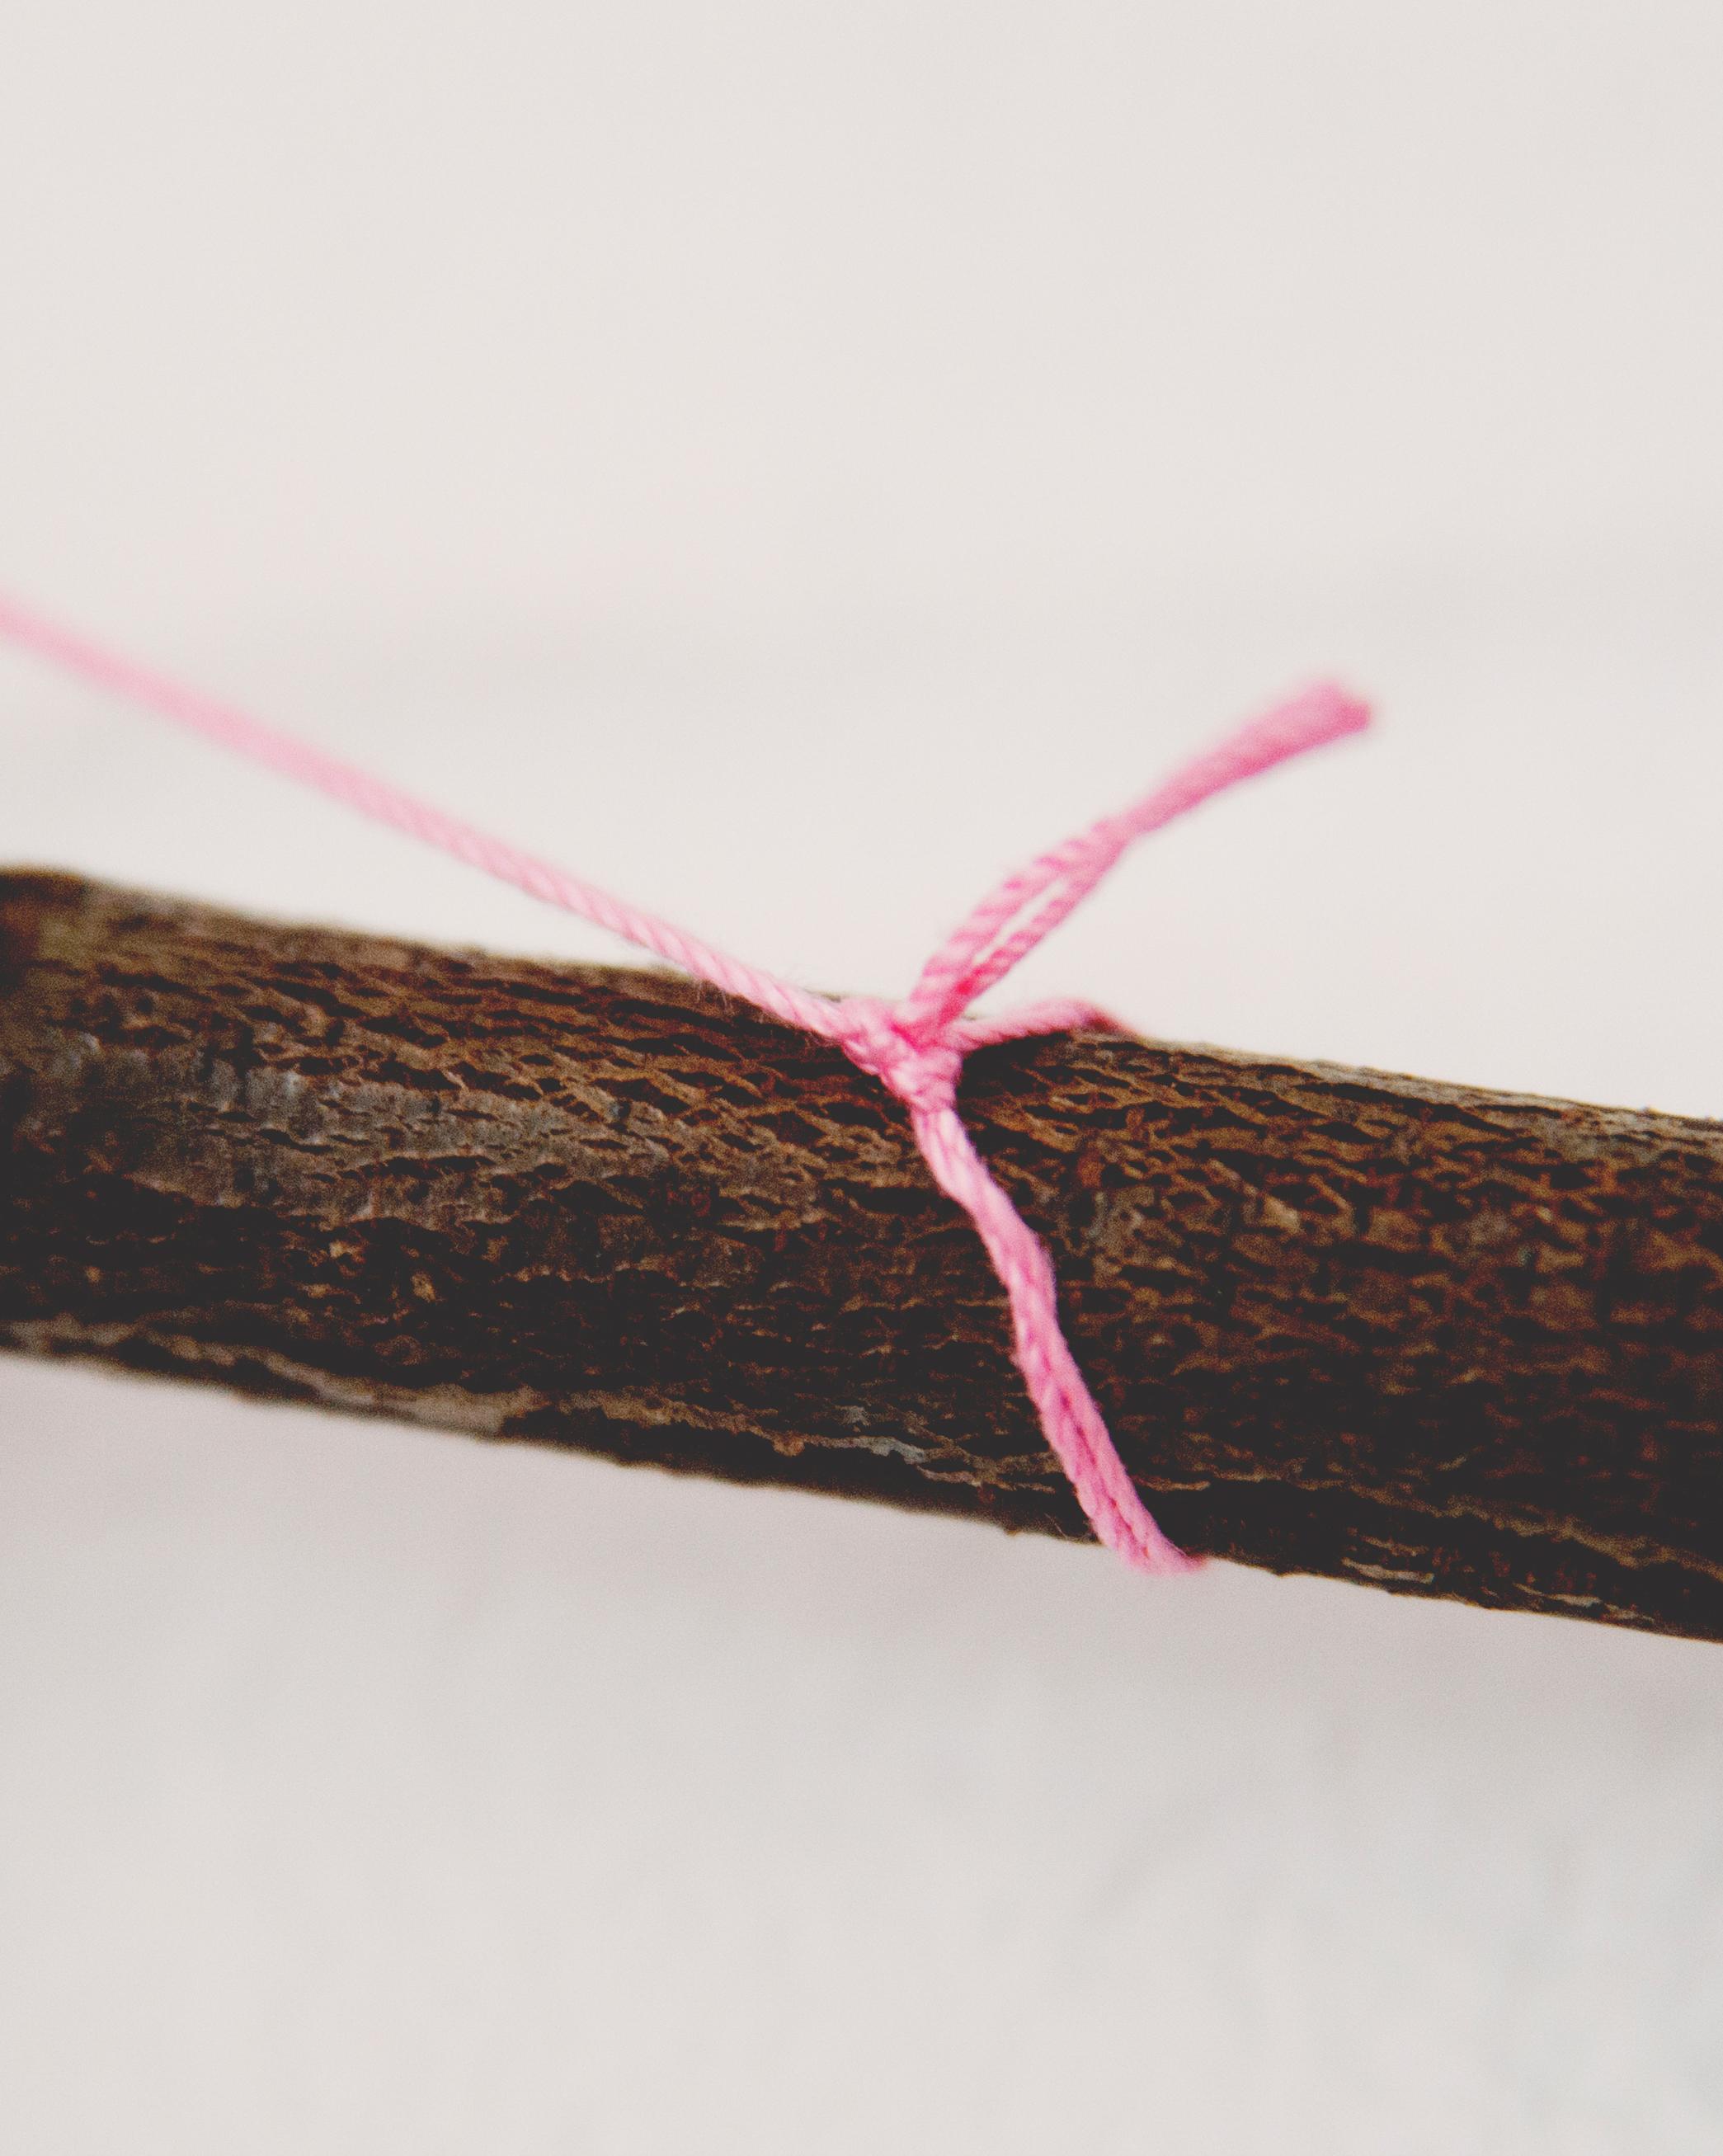 claire-thomas-bridal-shower-garden-diy-string-branch-0814.jpg